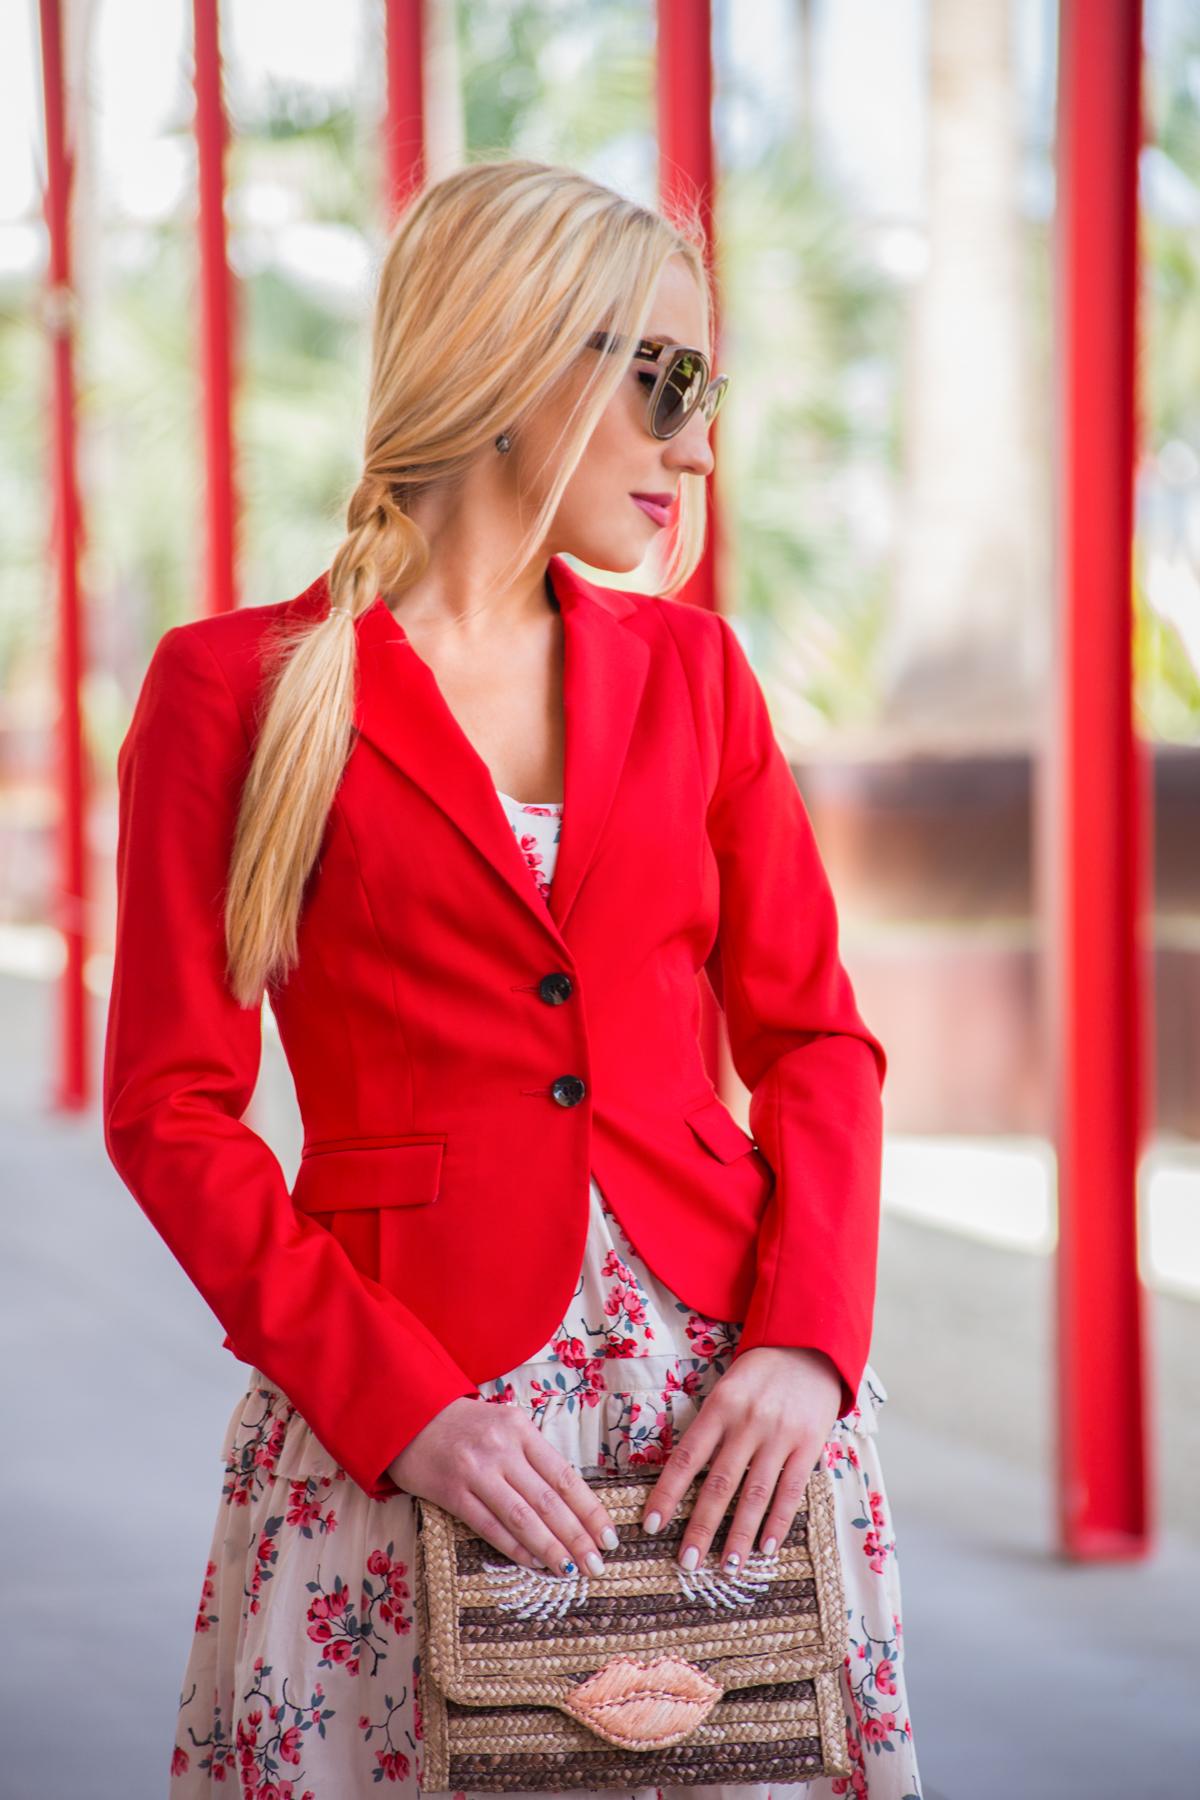 H&M jacket,felix rey kissy face clutch,lips clutch